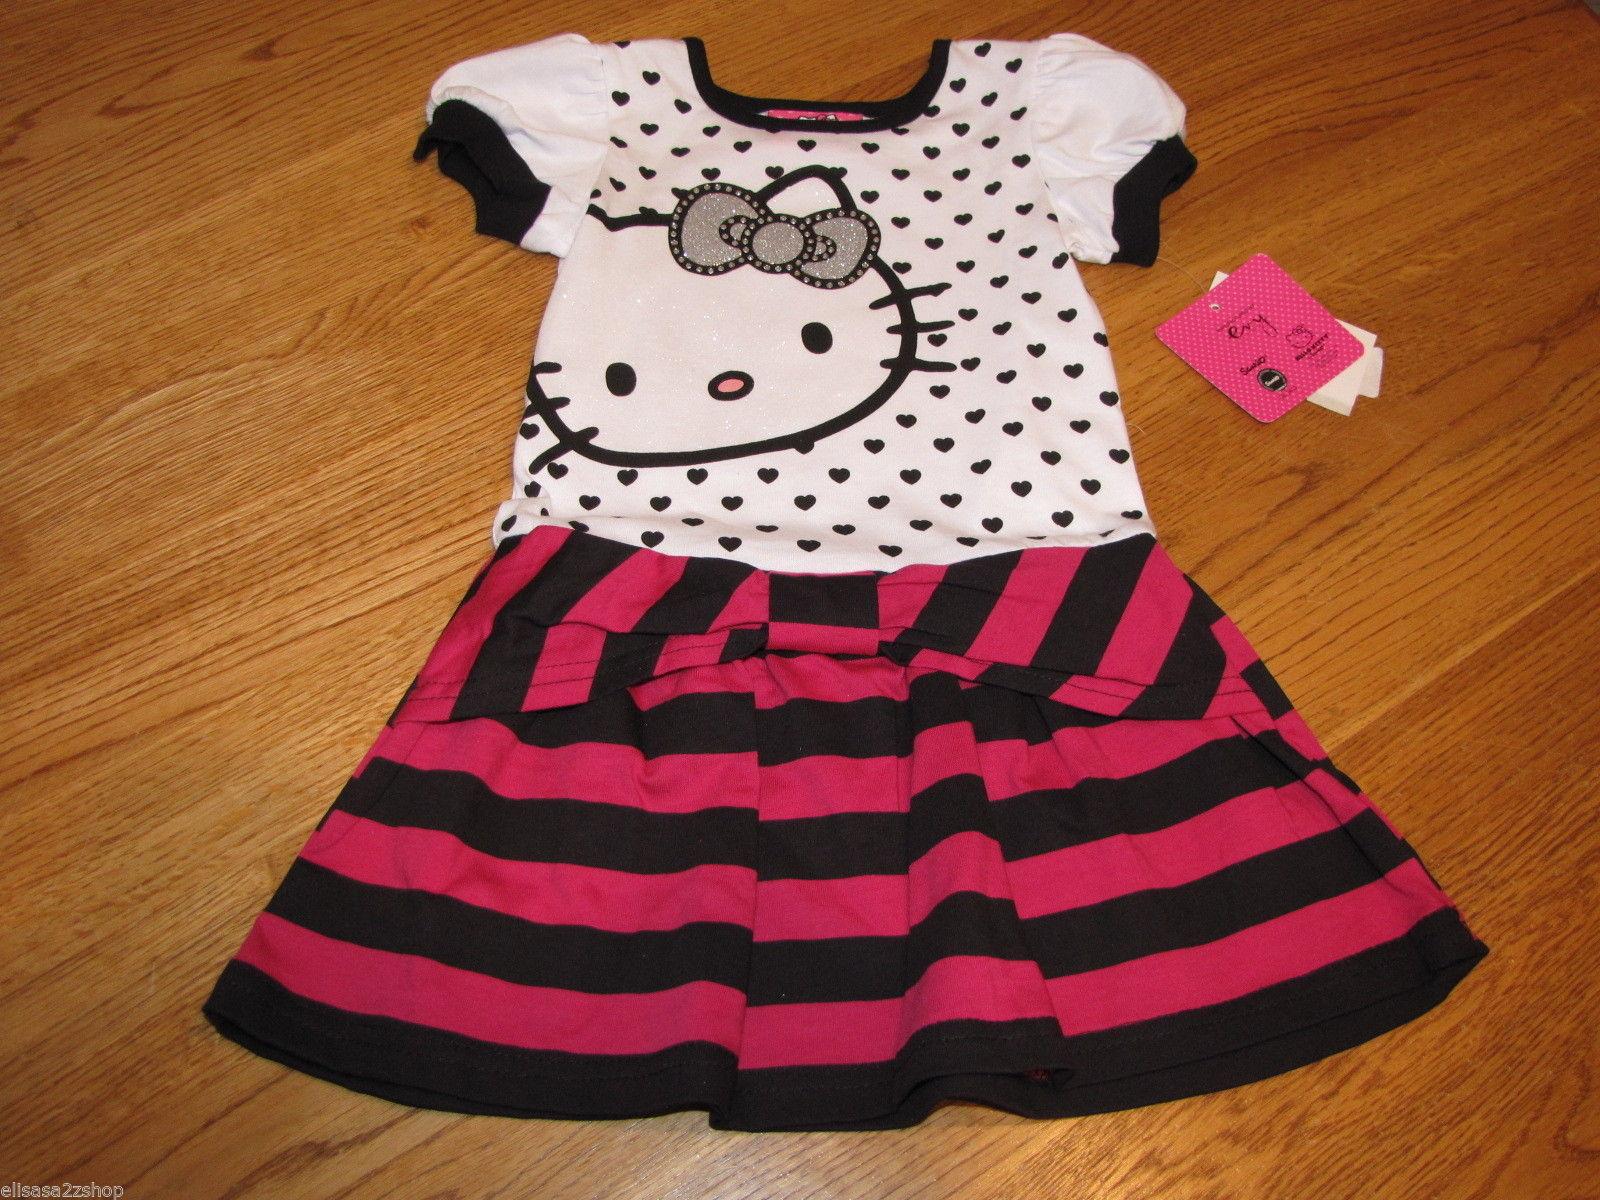 dda04ccd8 Girls youth Hello Kitty Dress 4 HK57738 and similar items. S l1600